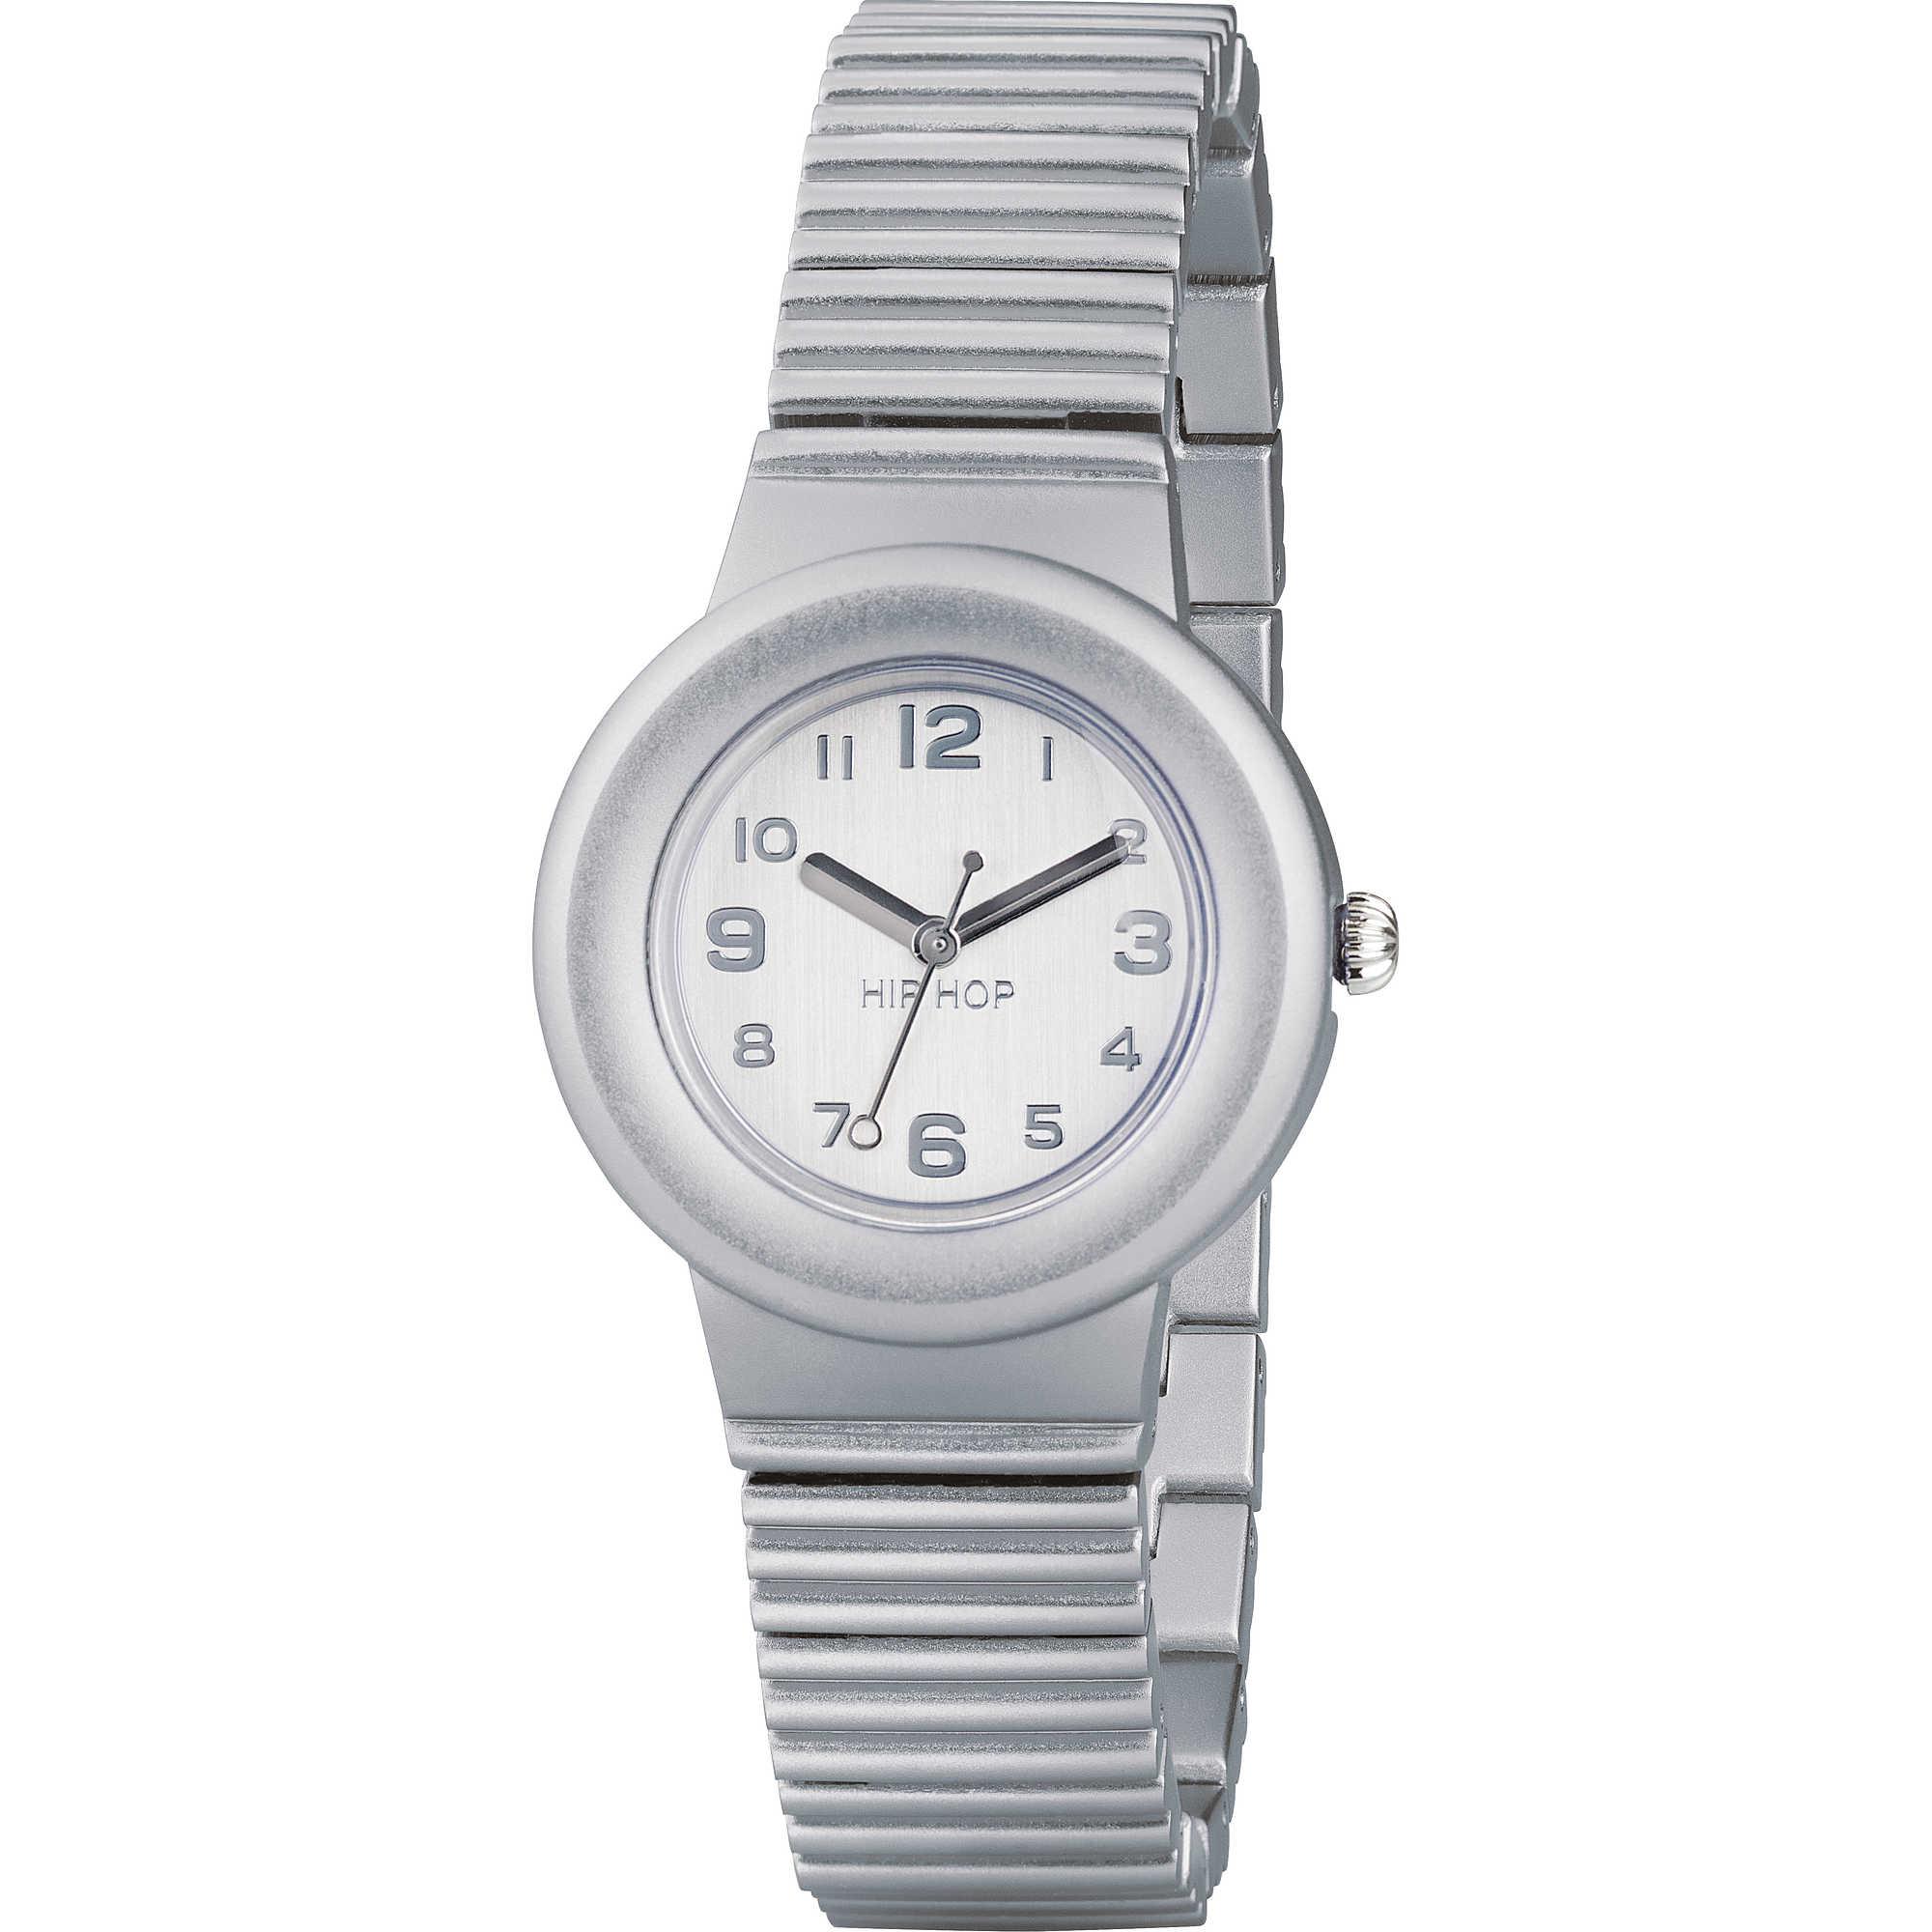 hip hop alluminio orologi